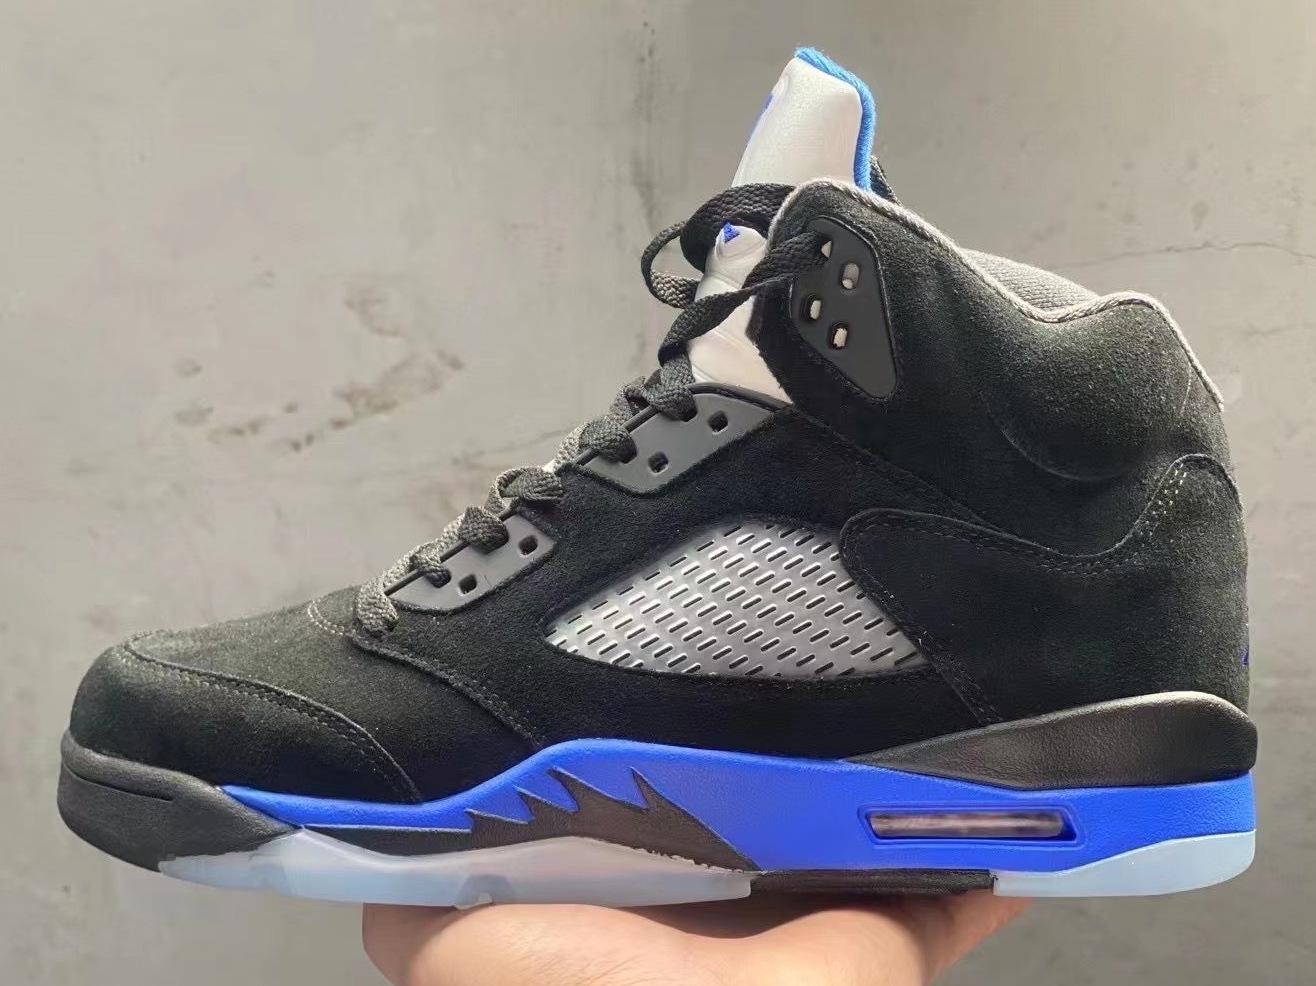 Release Date: Air Jordan 5 'Racer Blue'